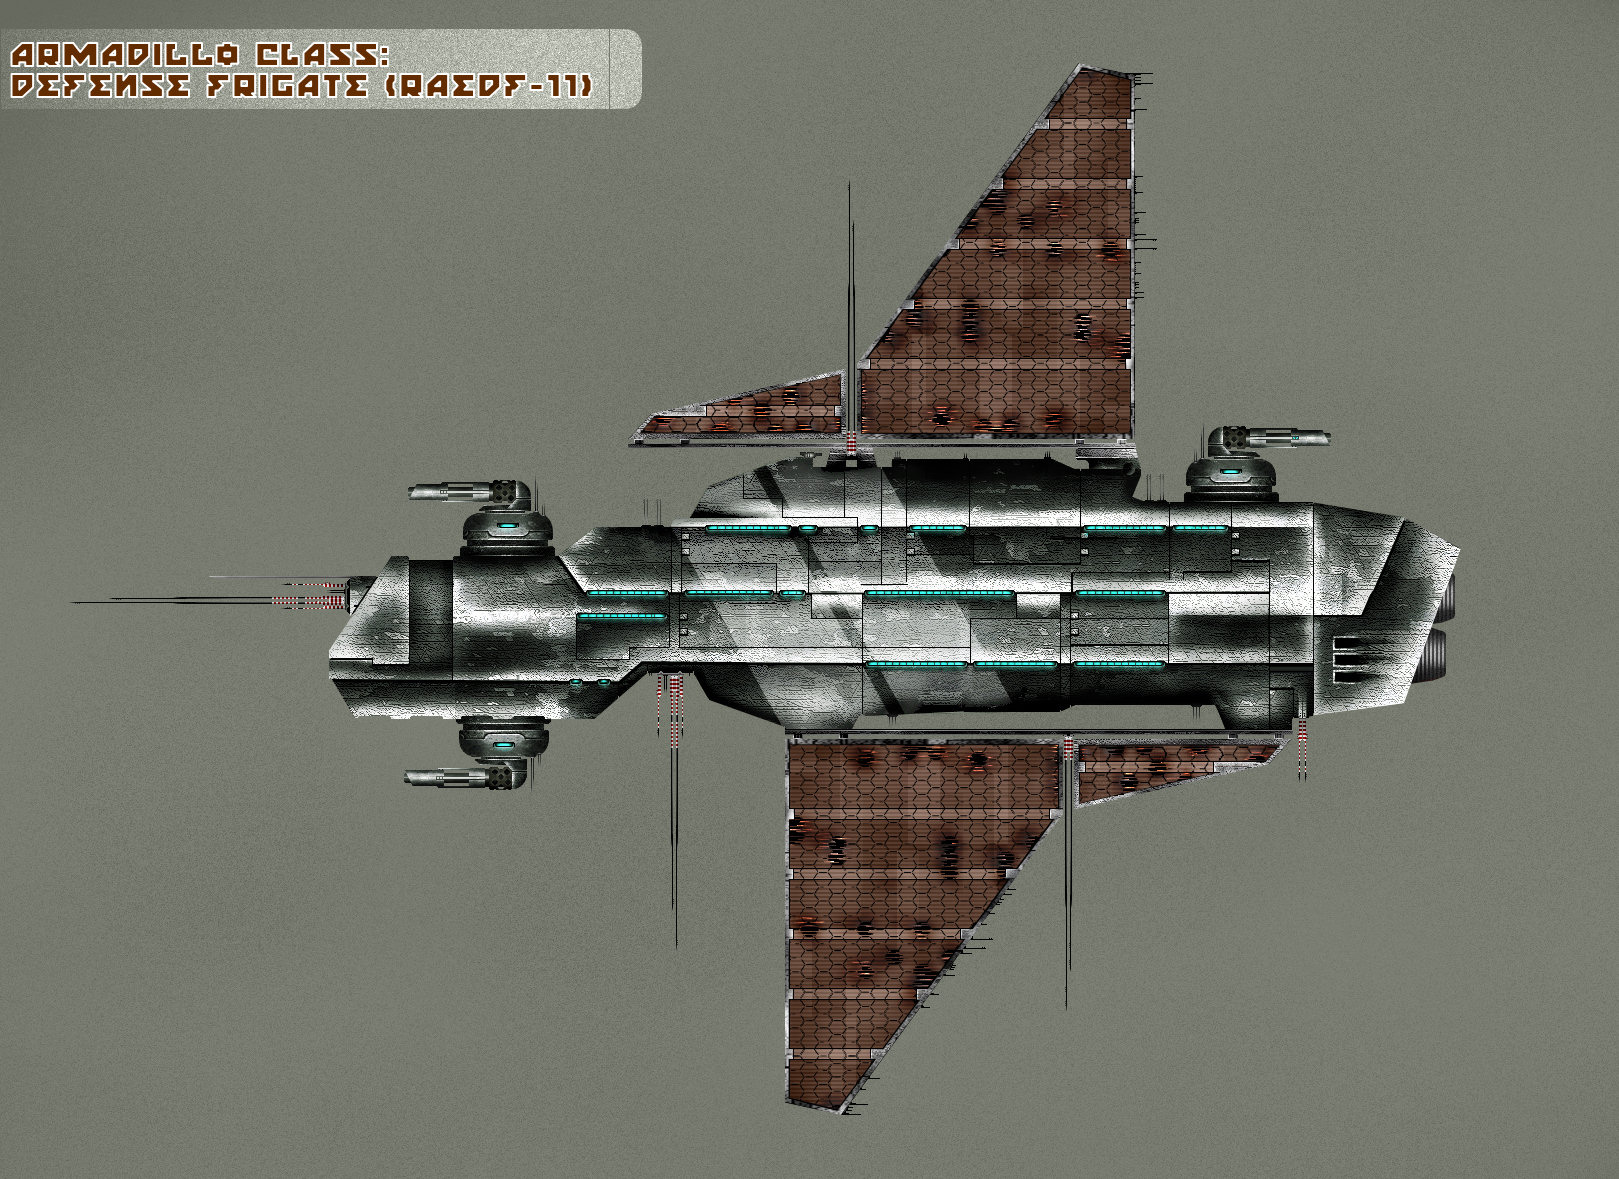 Armadillo class: Defense Frig by RadASS